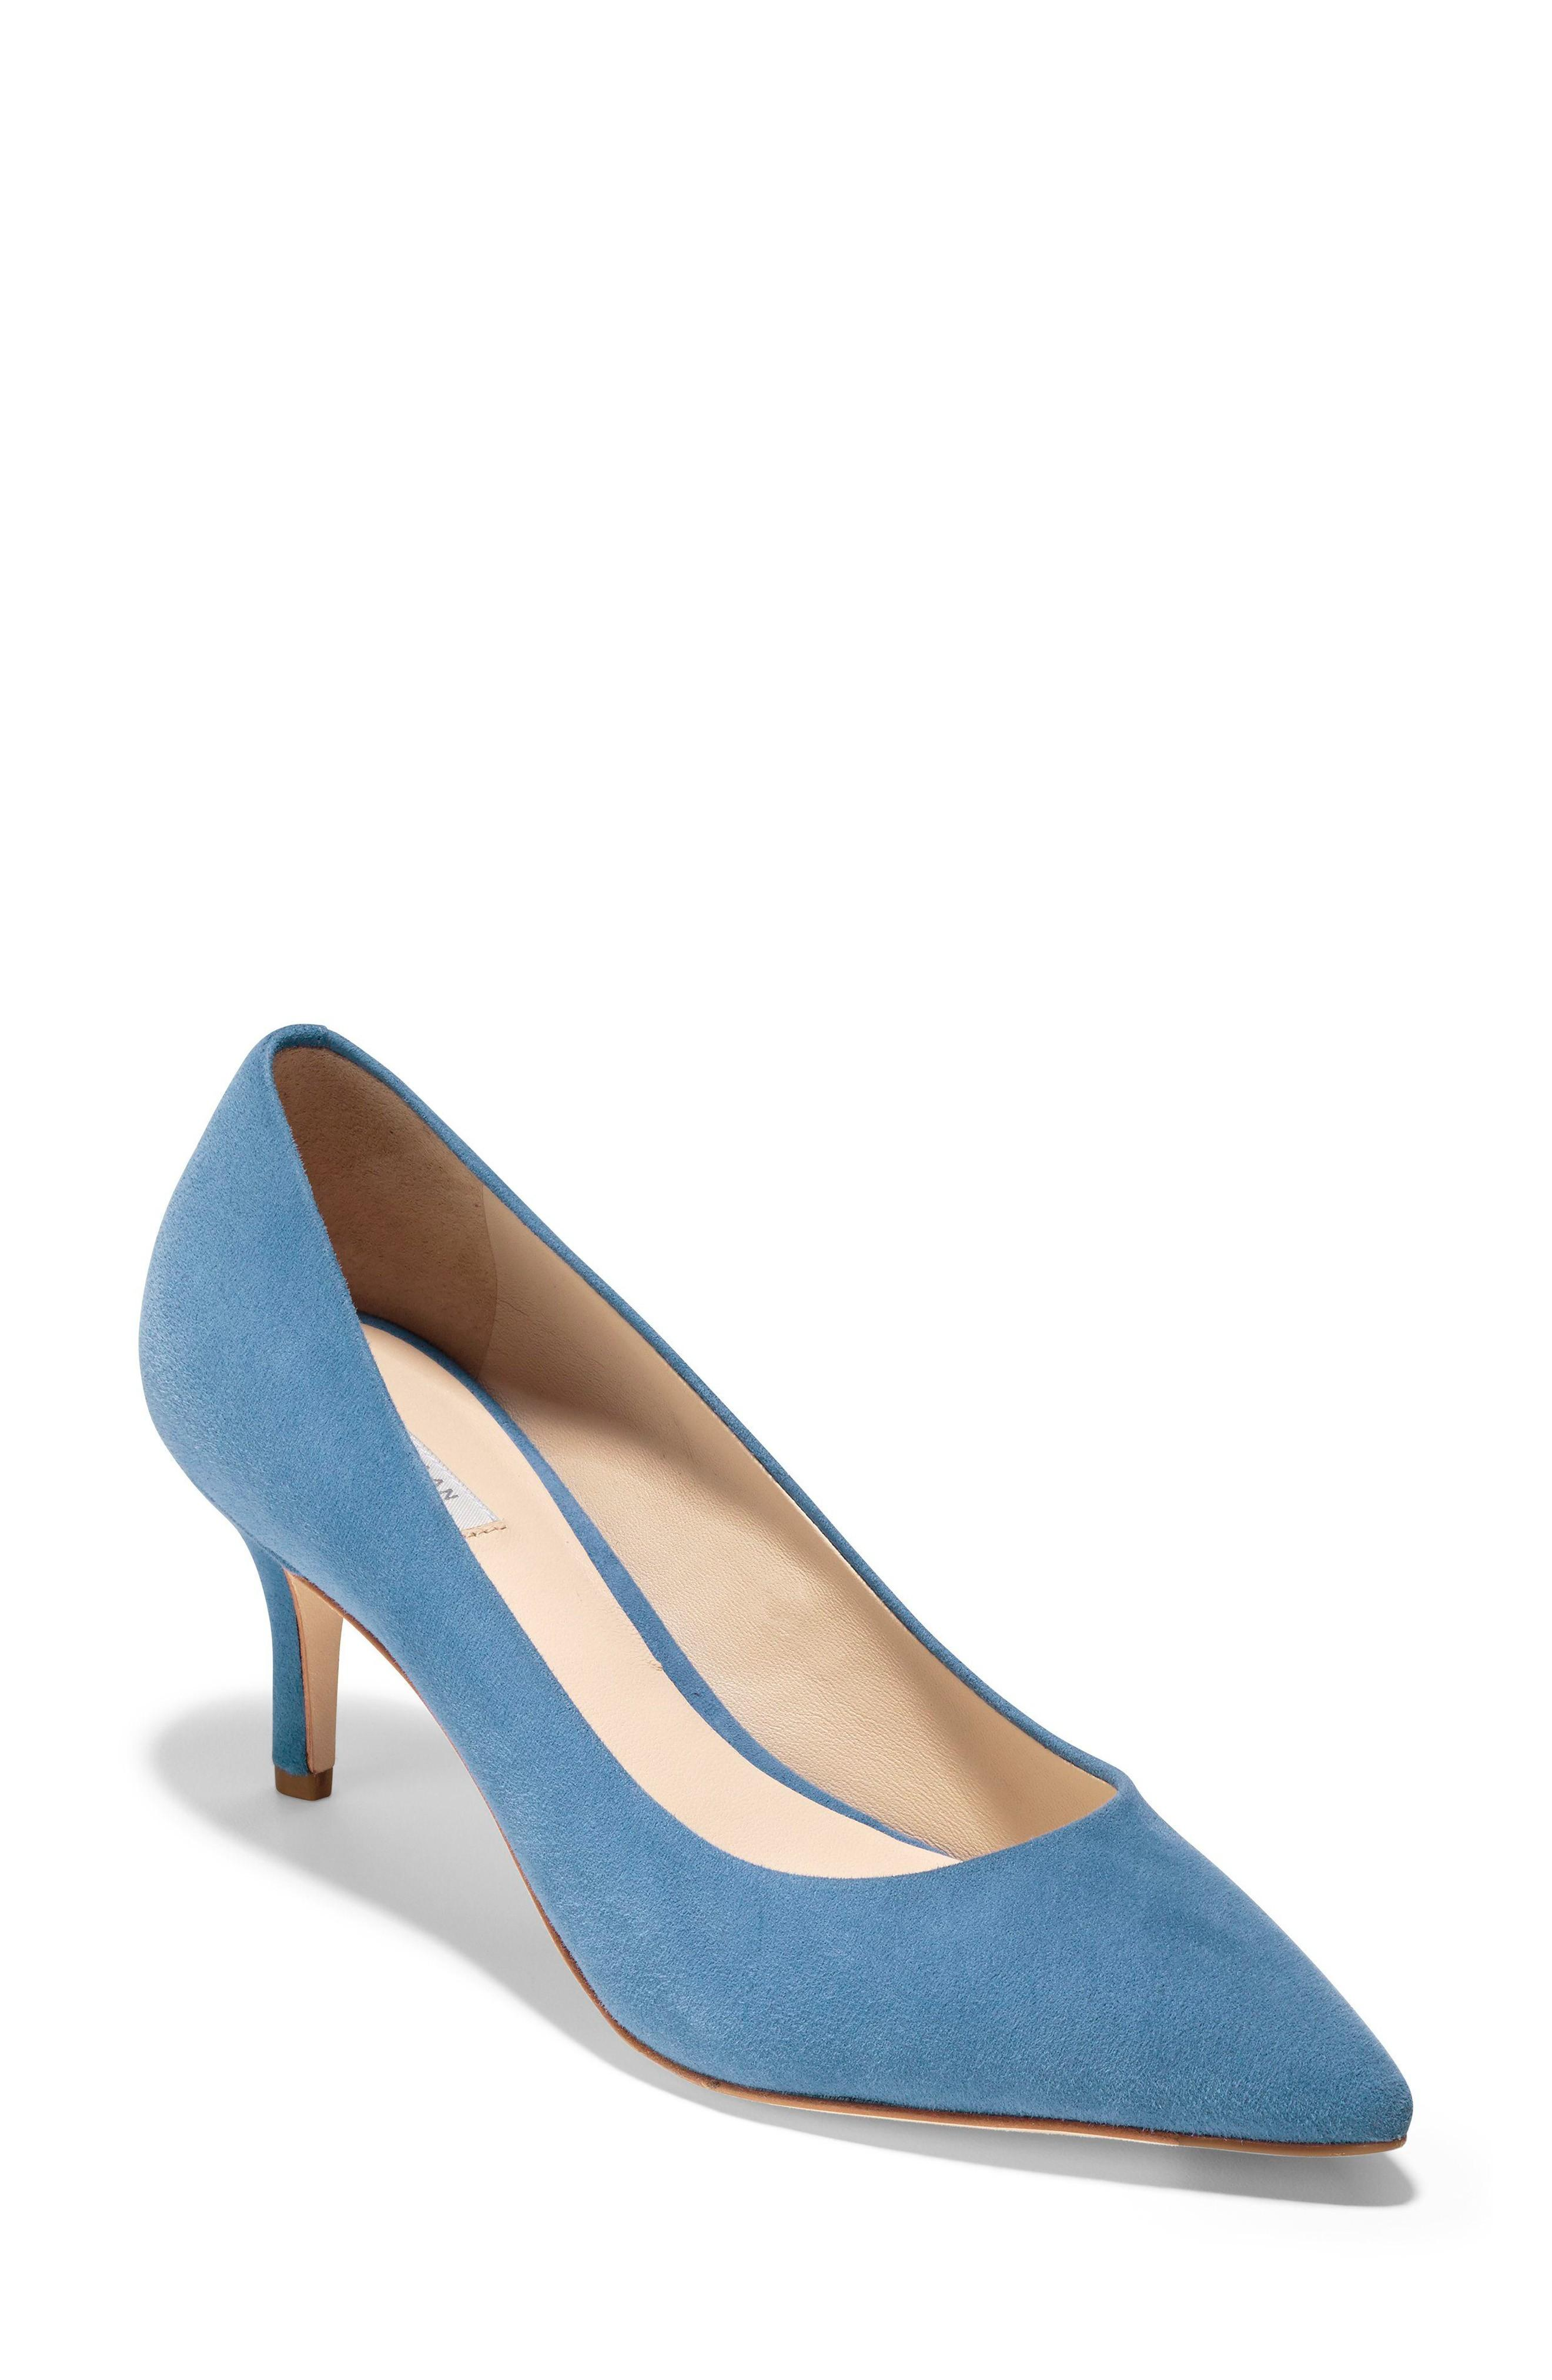 Cole Haan Vesta Pointy Toe Pump In Riverside Blue Suede